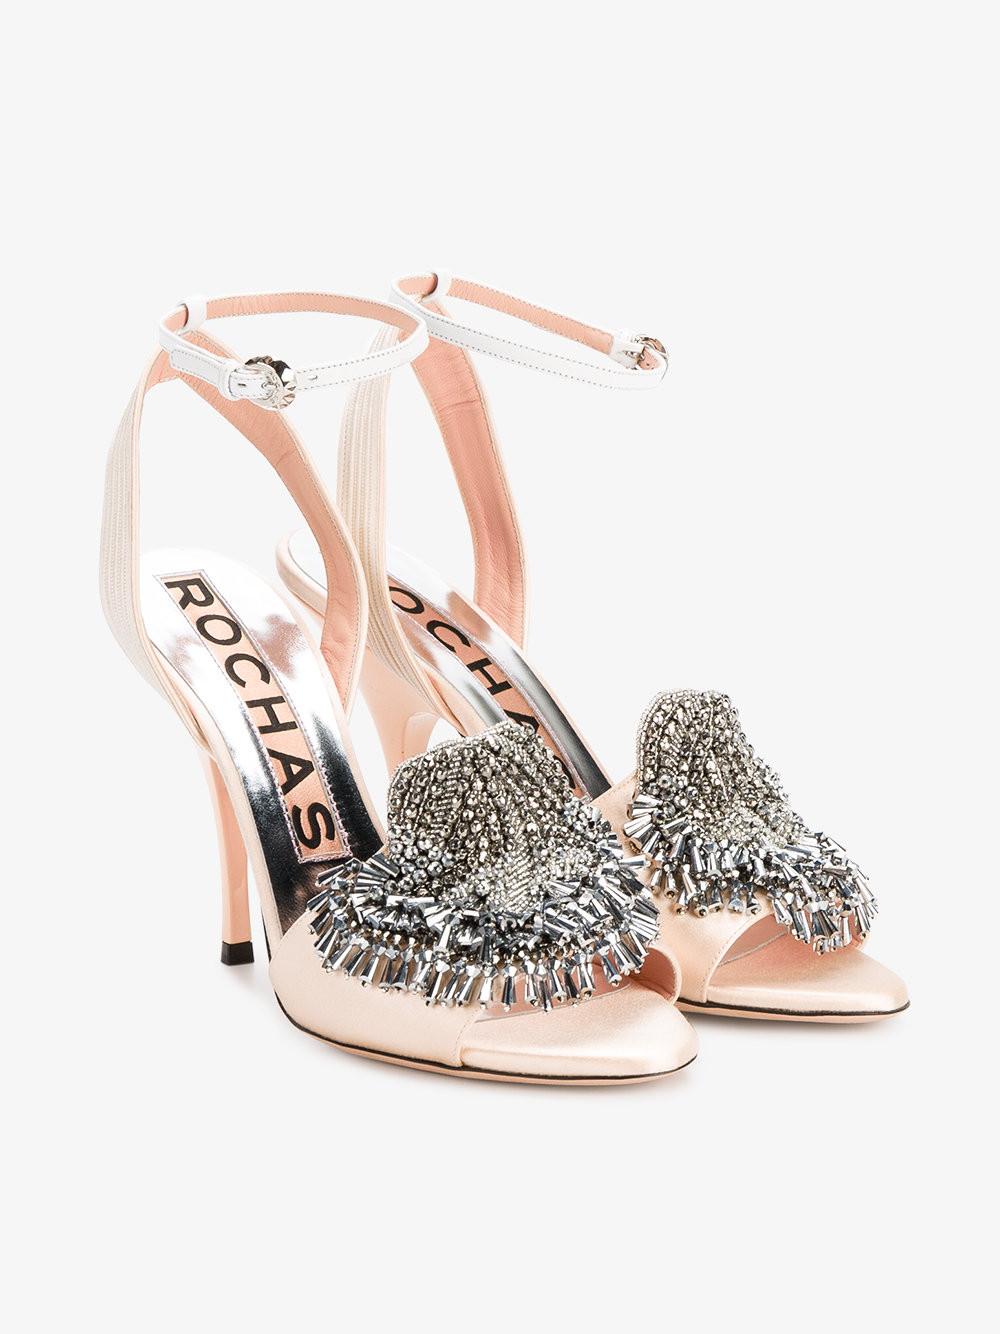 Rochas Mid-Heel Satin Open-Toe Pumps With Crystal Embellishment